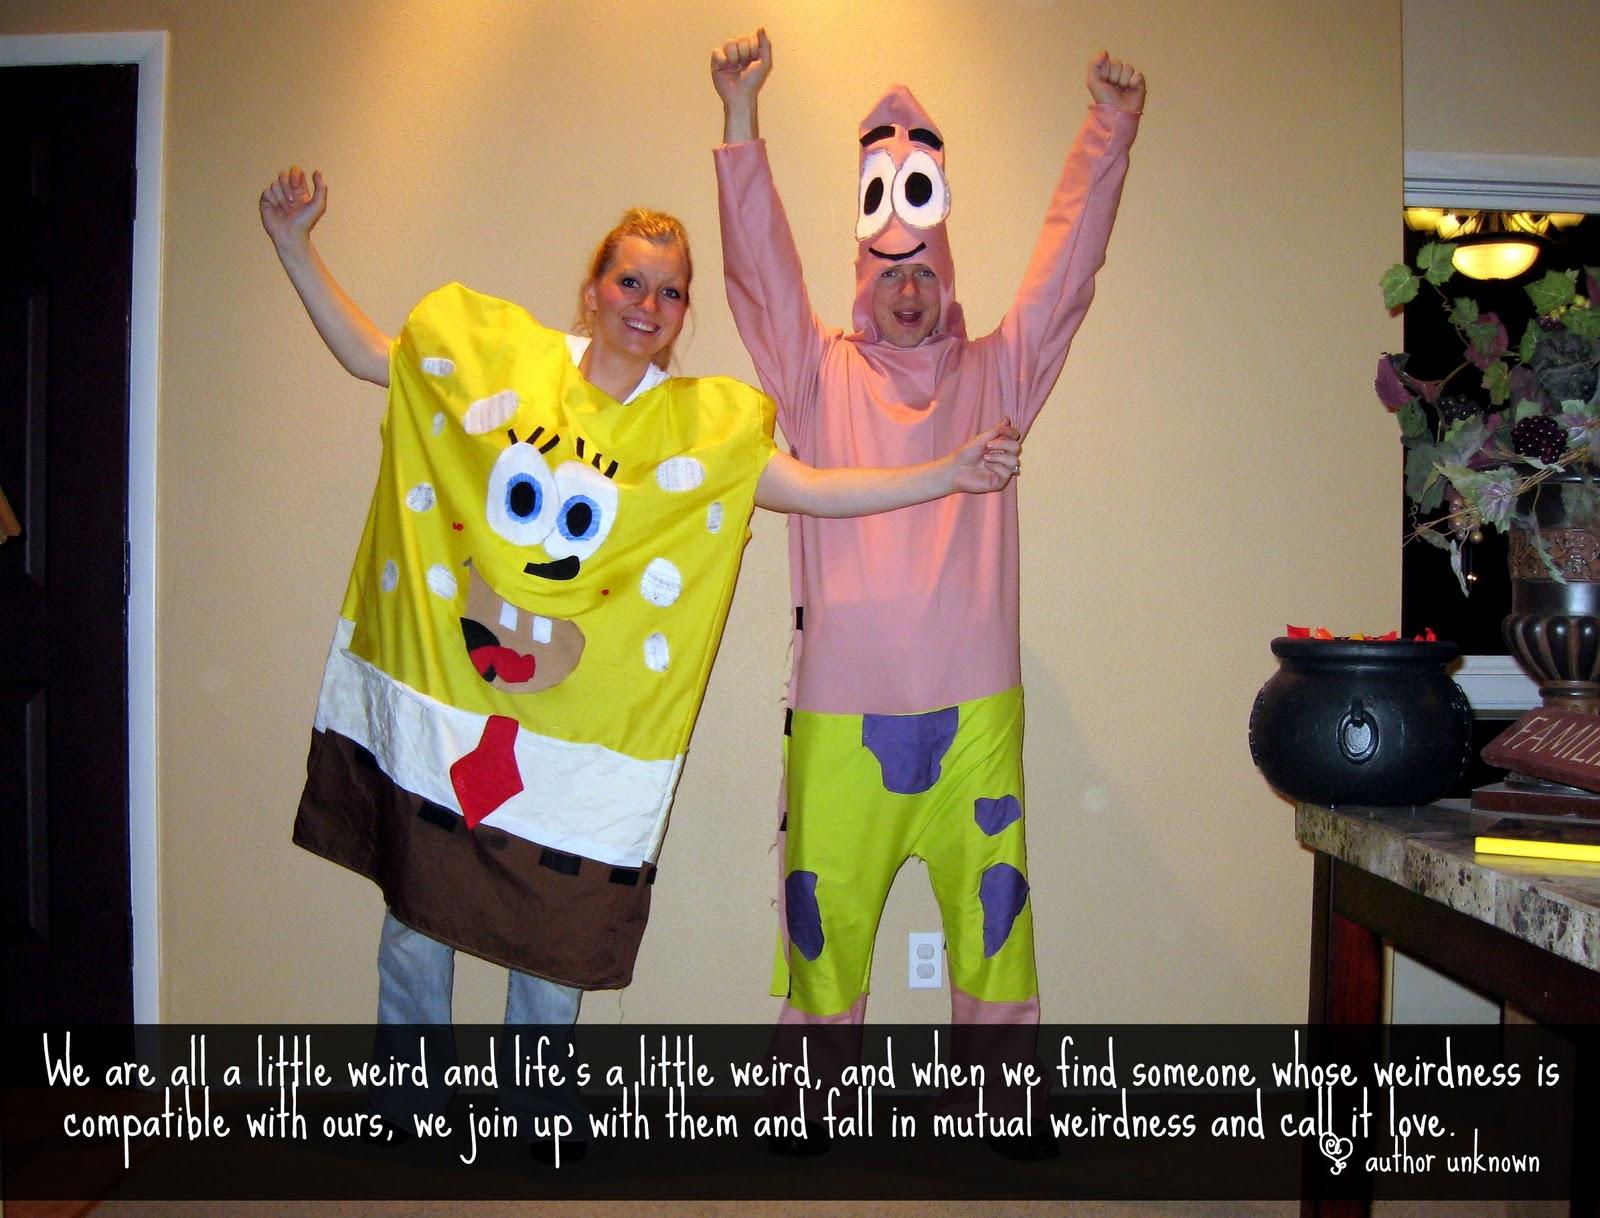 Spongebob Normal Quotes